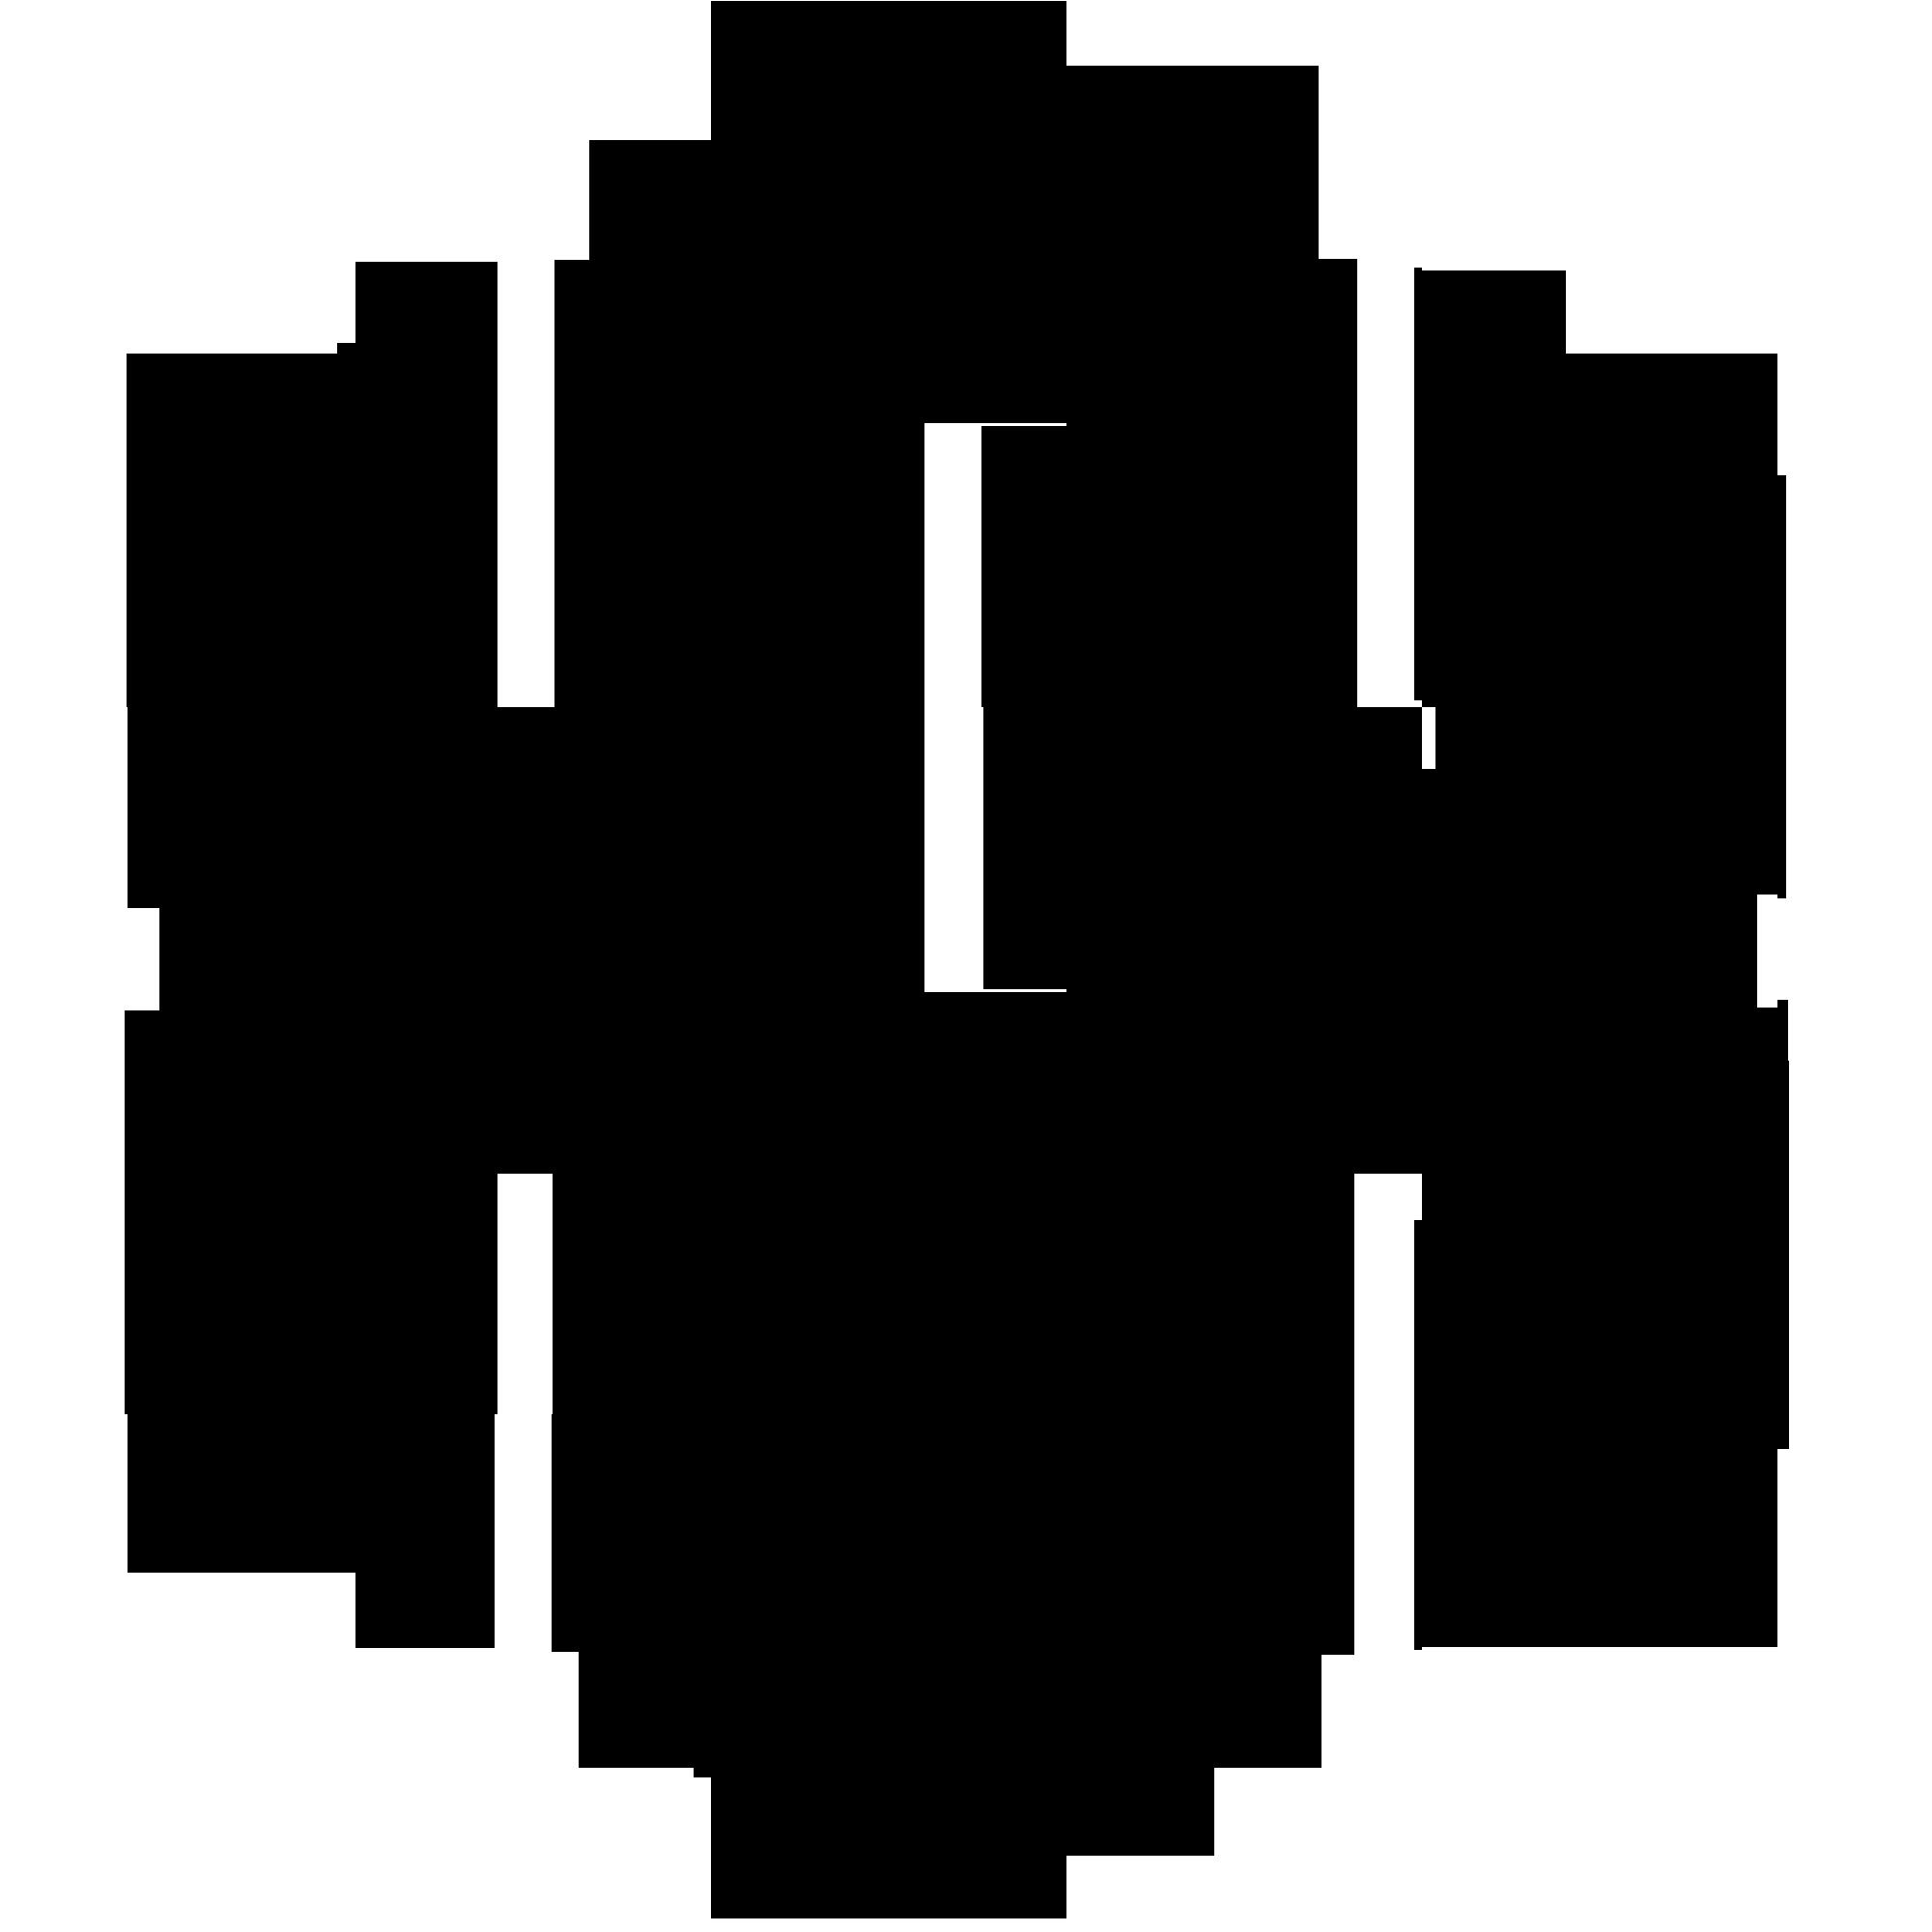 Blume's logo